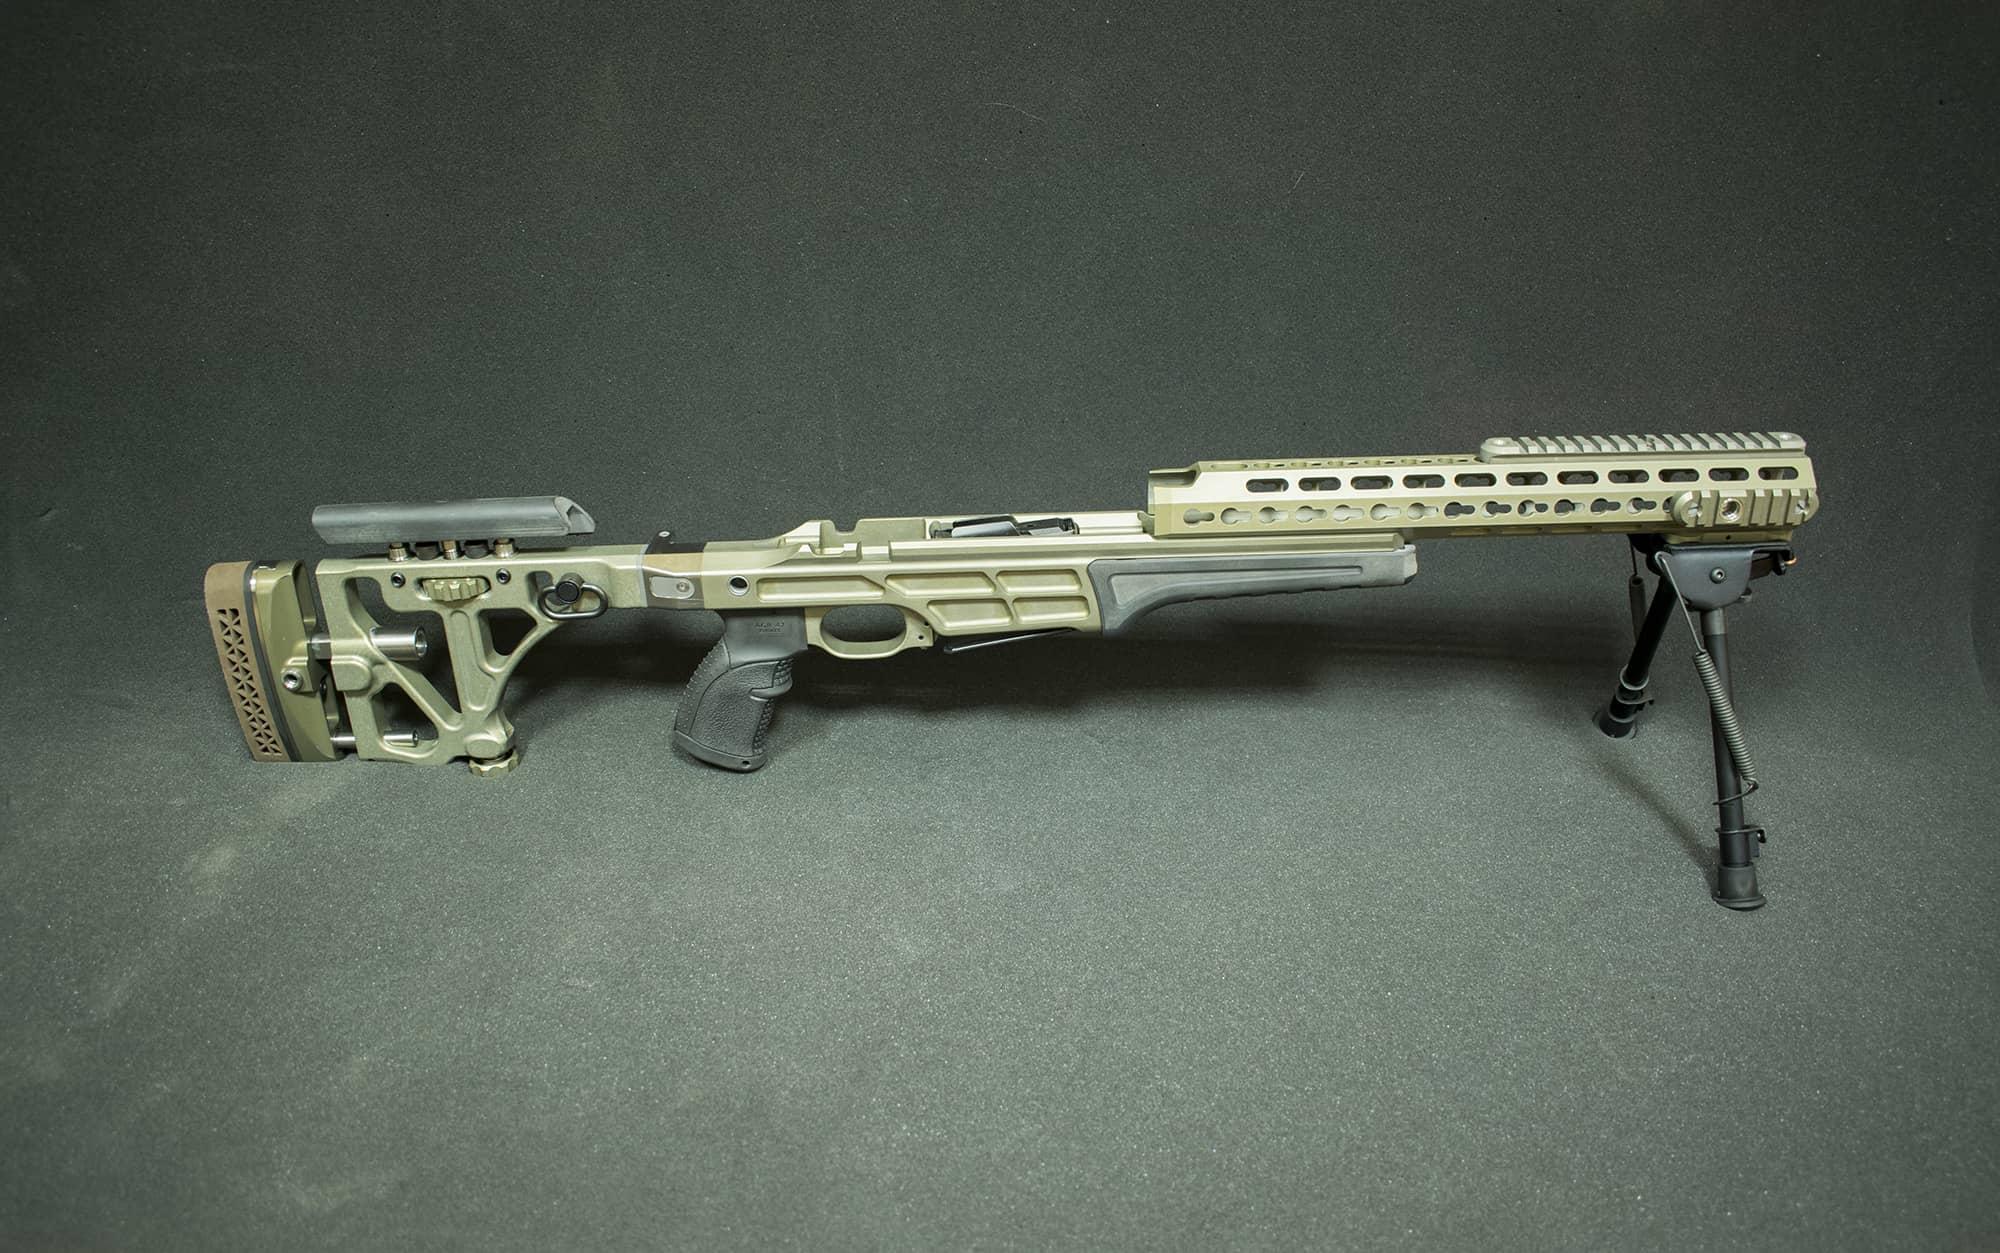 Remington 700 Ложа OV-R700